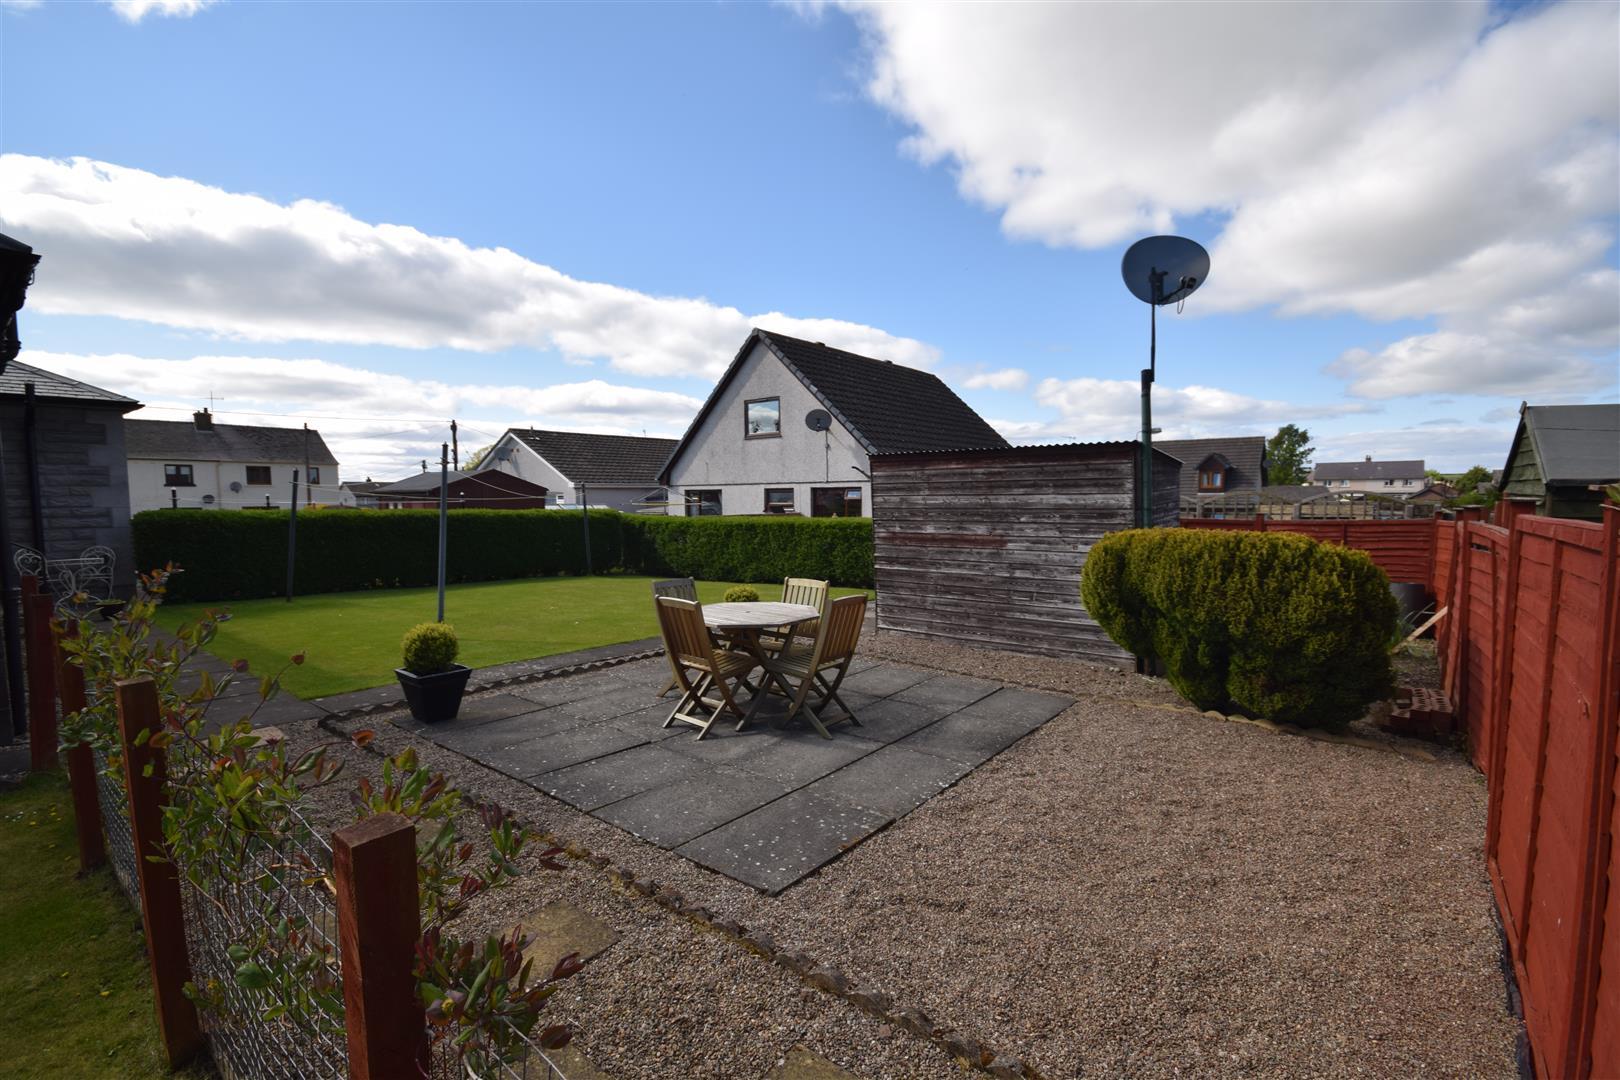 Glenearn Cottage, Green Road, Balbeggie, Perthshire, PH2 6EY, UK